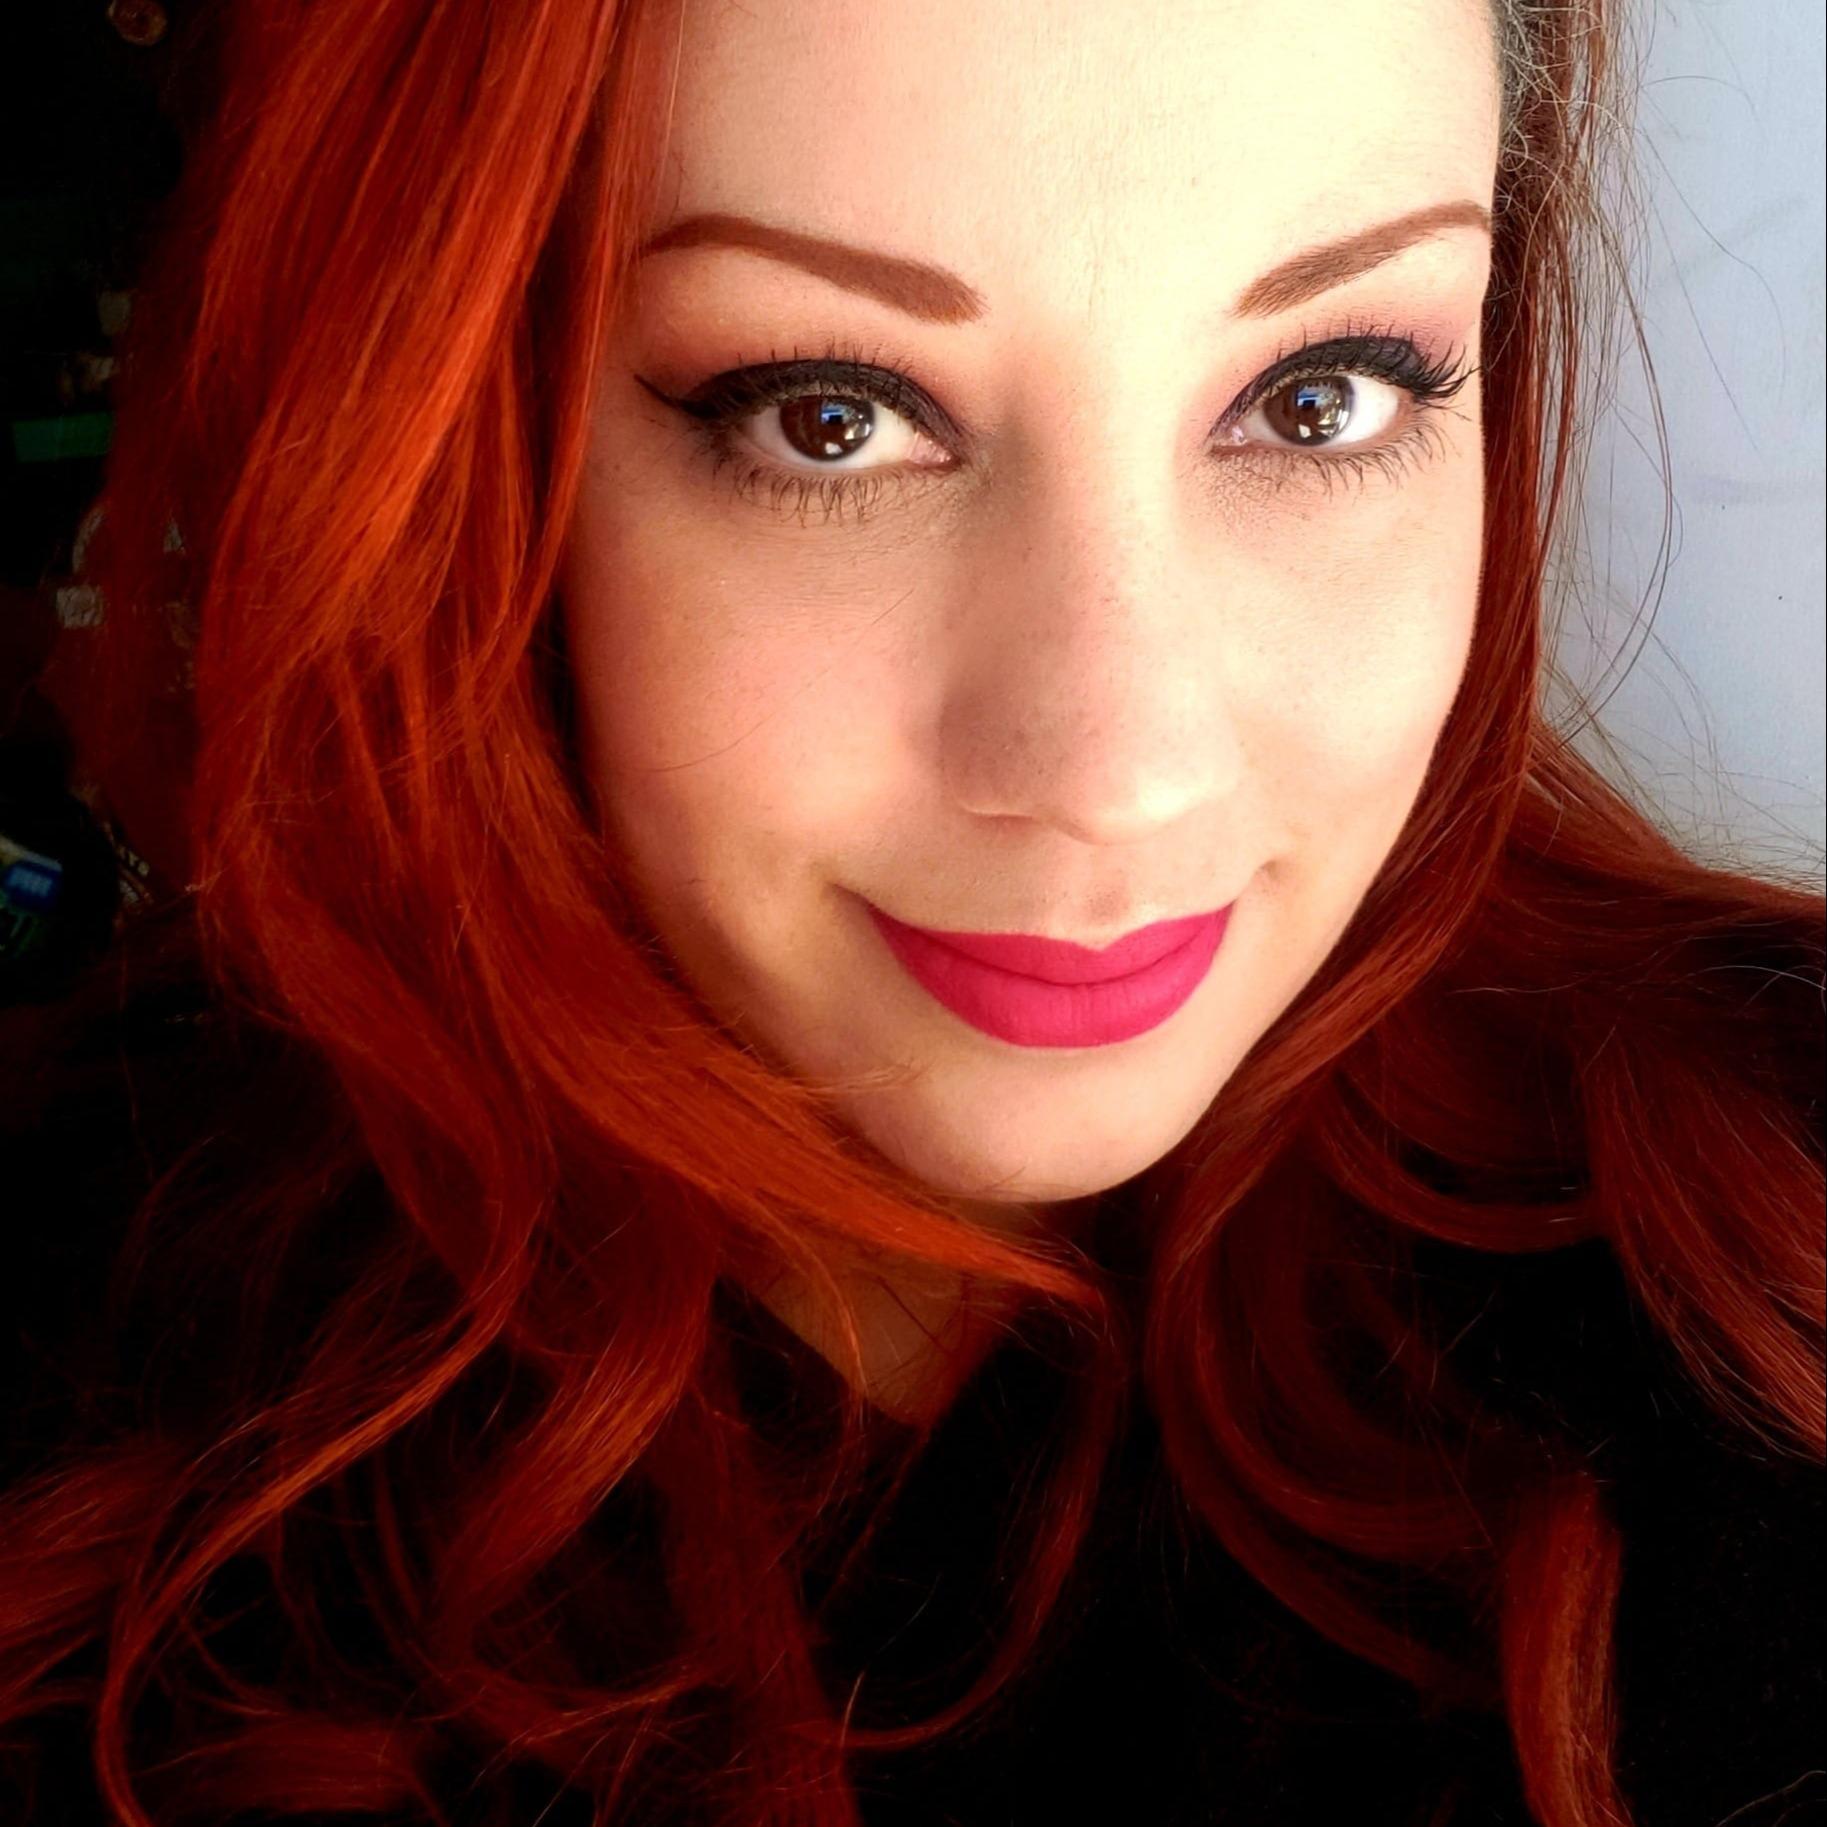 Shannon Hilson (shannonhilson) Profile Image   Linktree